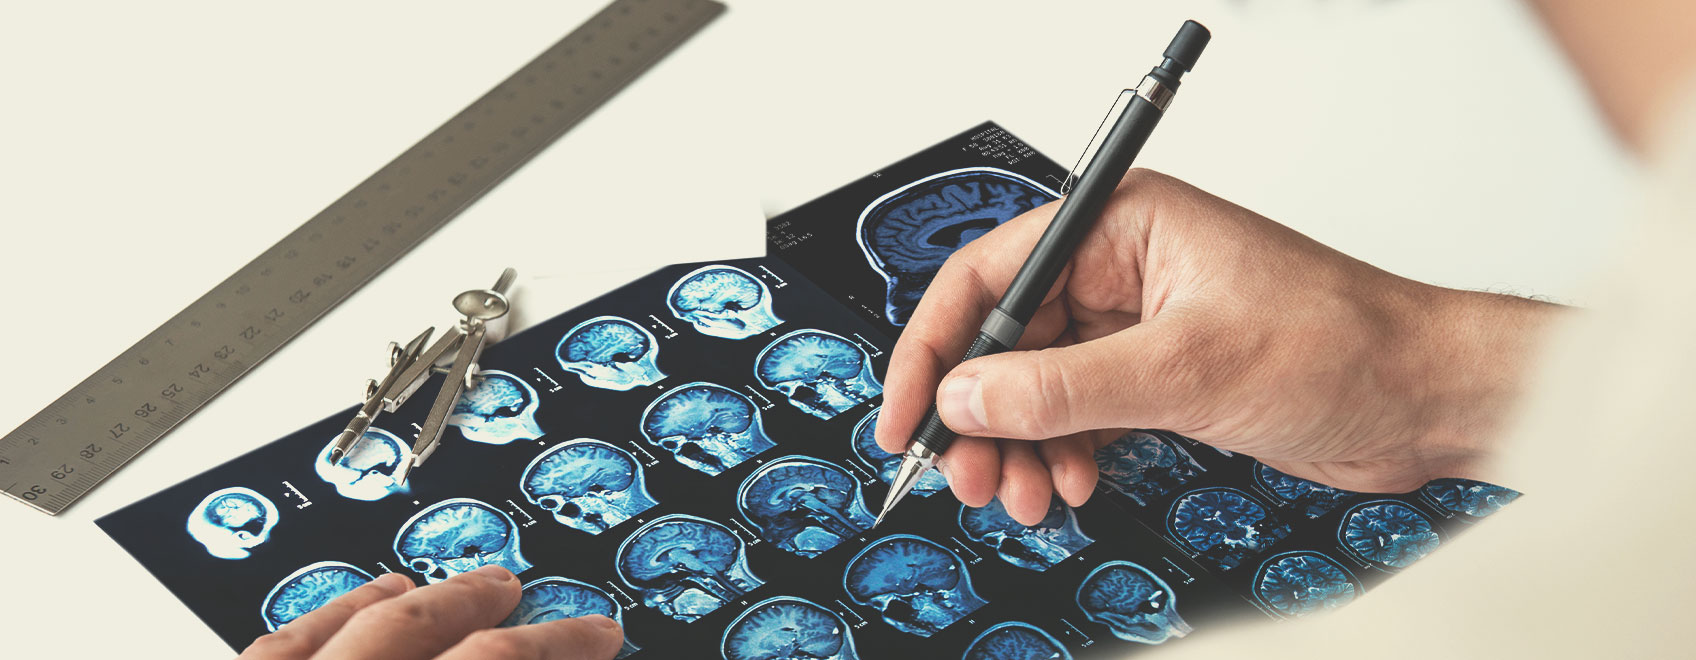 Tipos de esclerosis múltiple